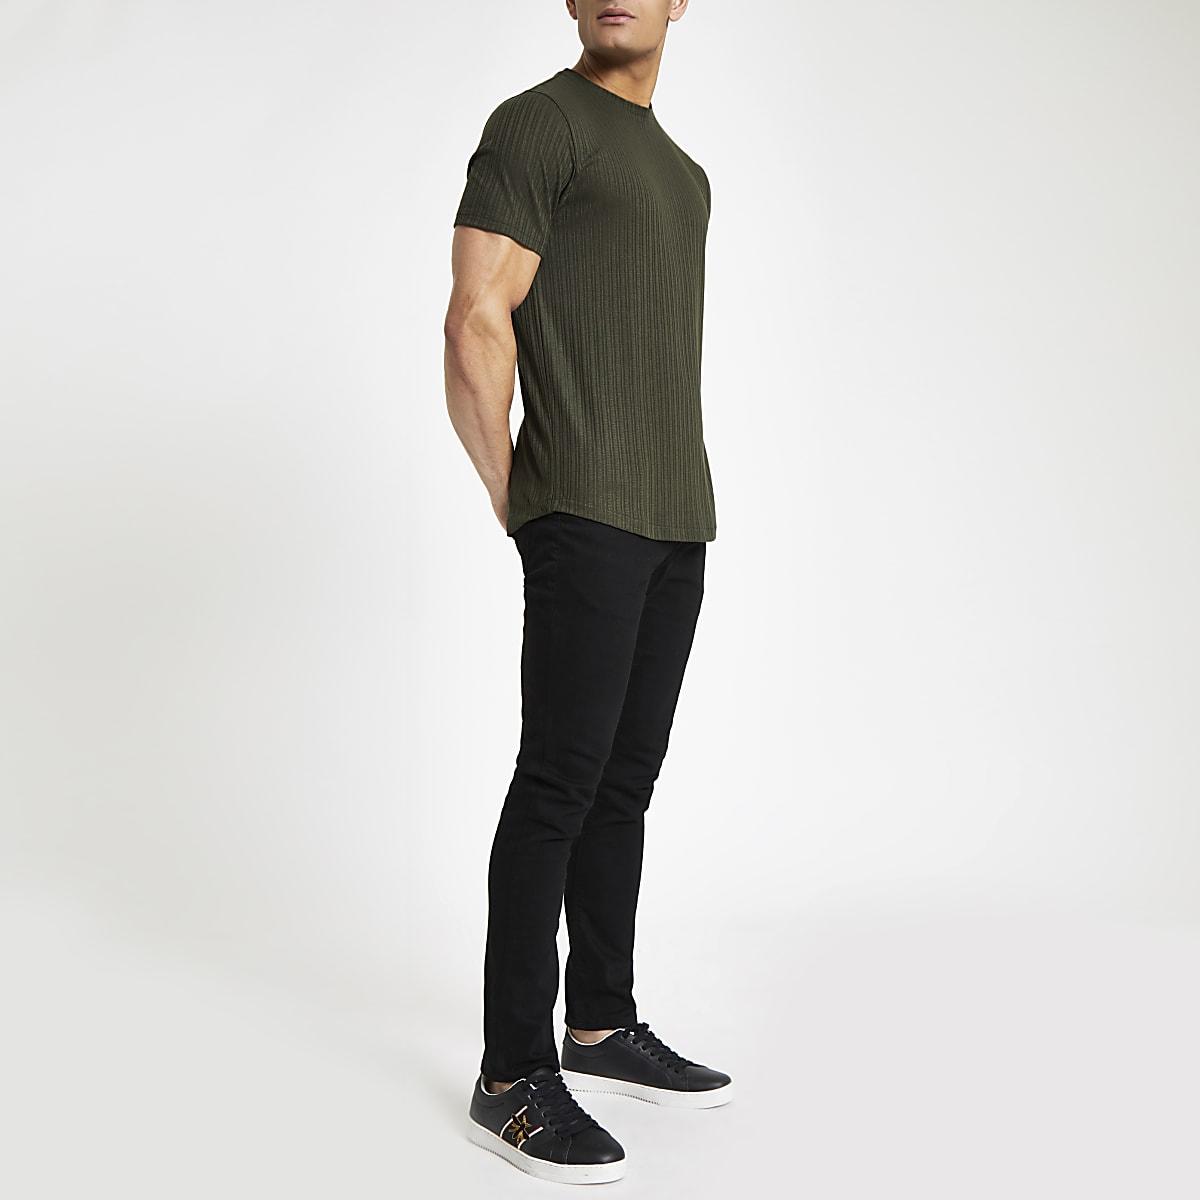 Green ribbed slim fit top